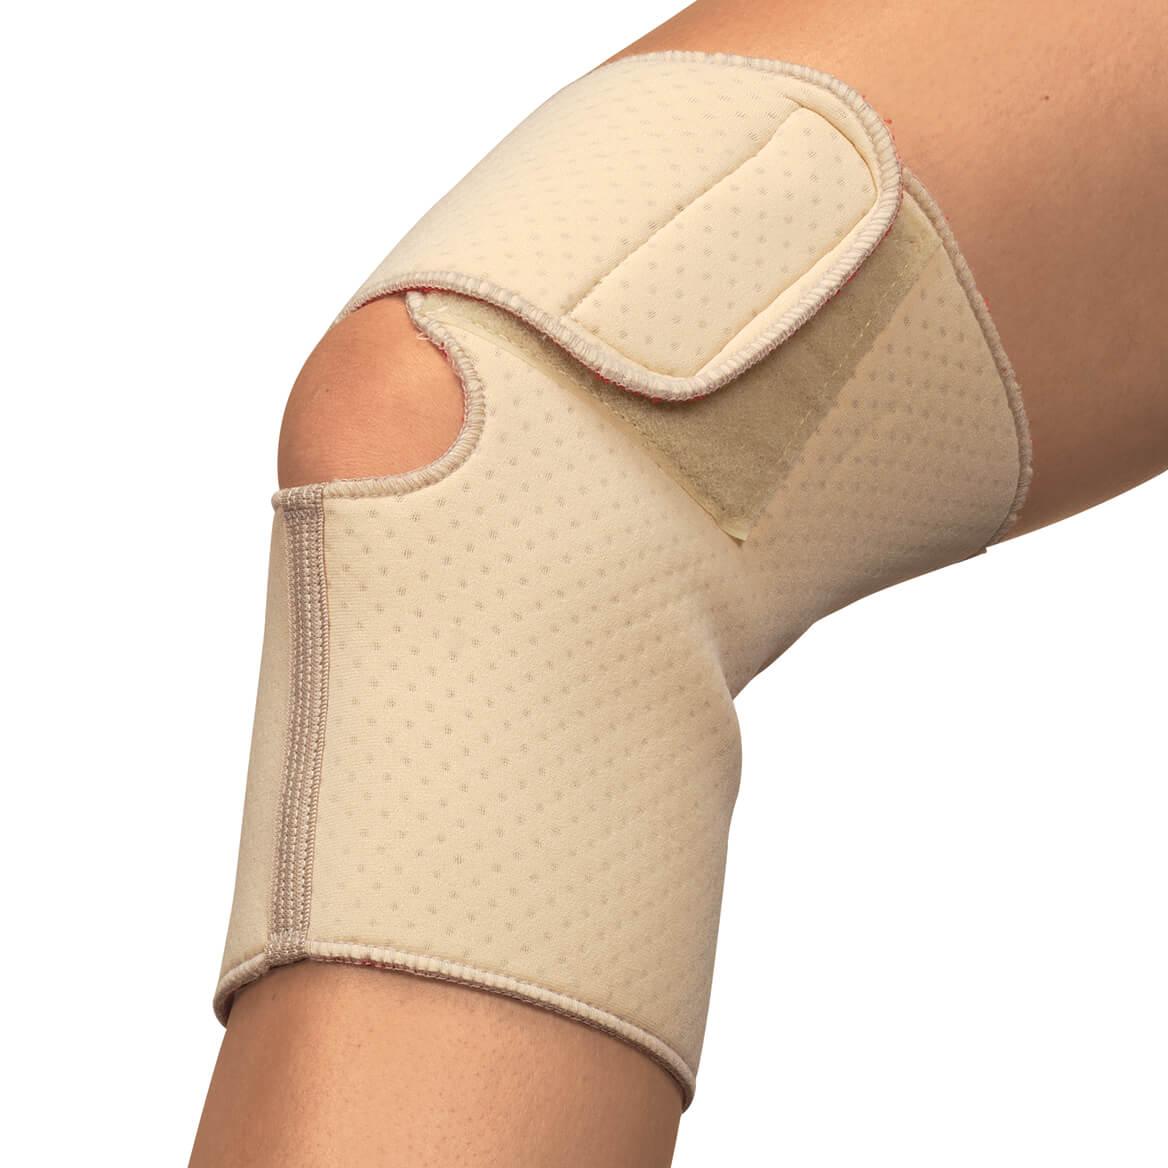 Arthritic Neoprene Knee Wrap-361274